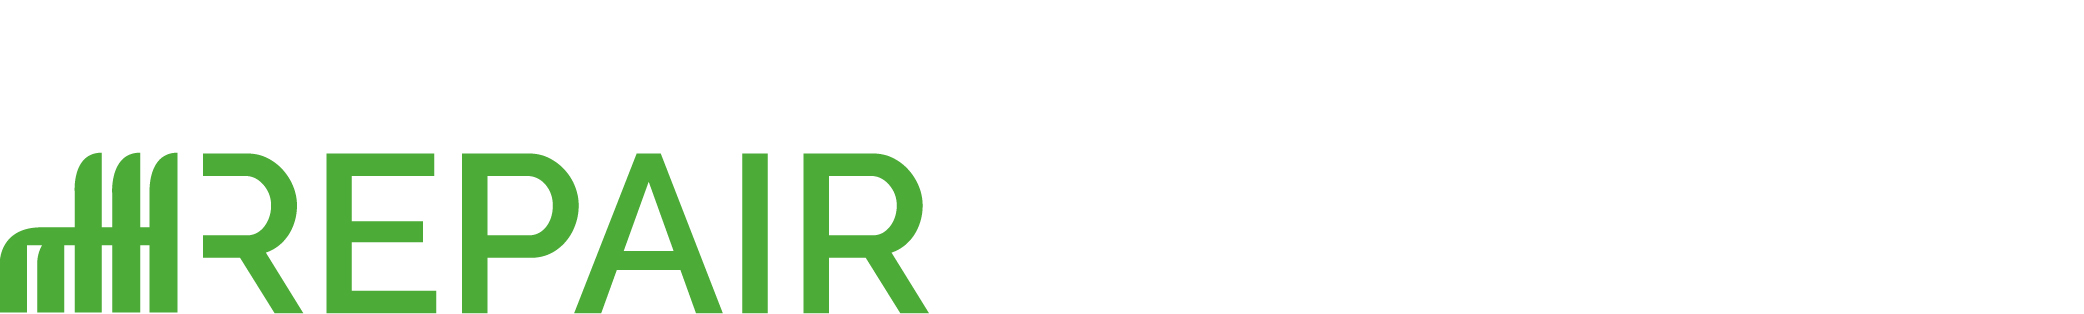 REPAIR, impegnogreen, greenpledge